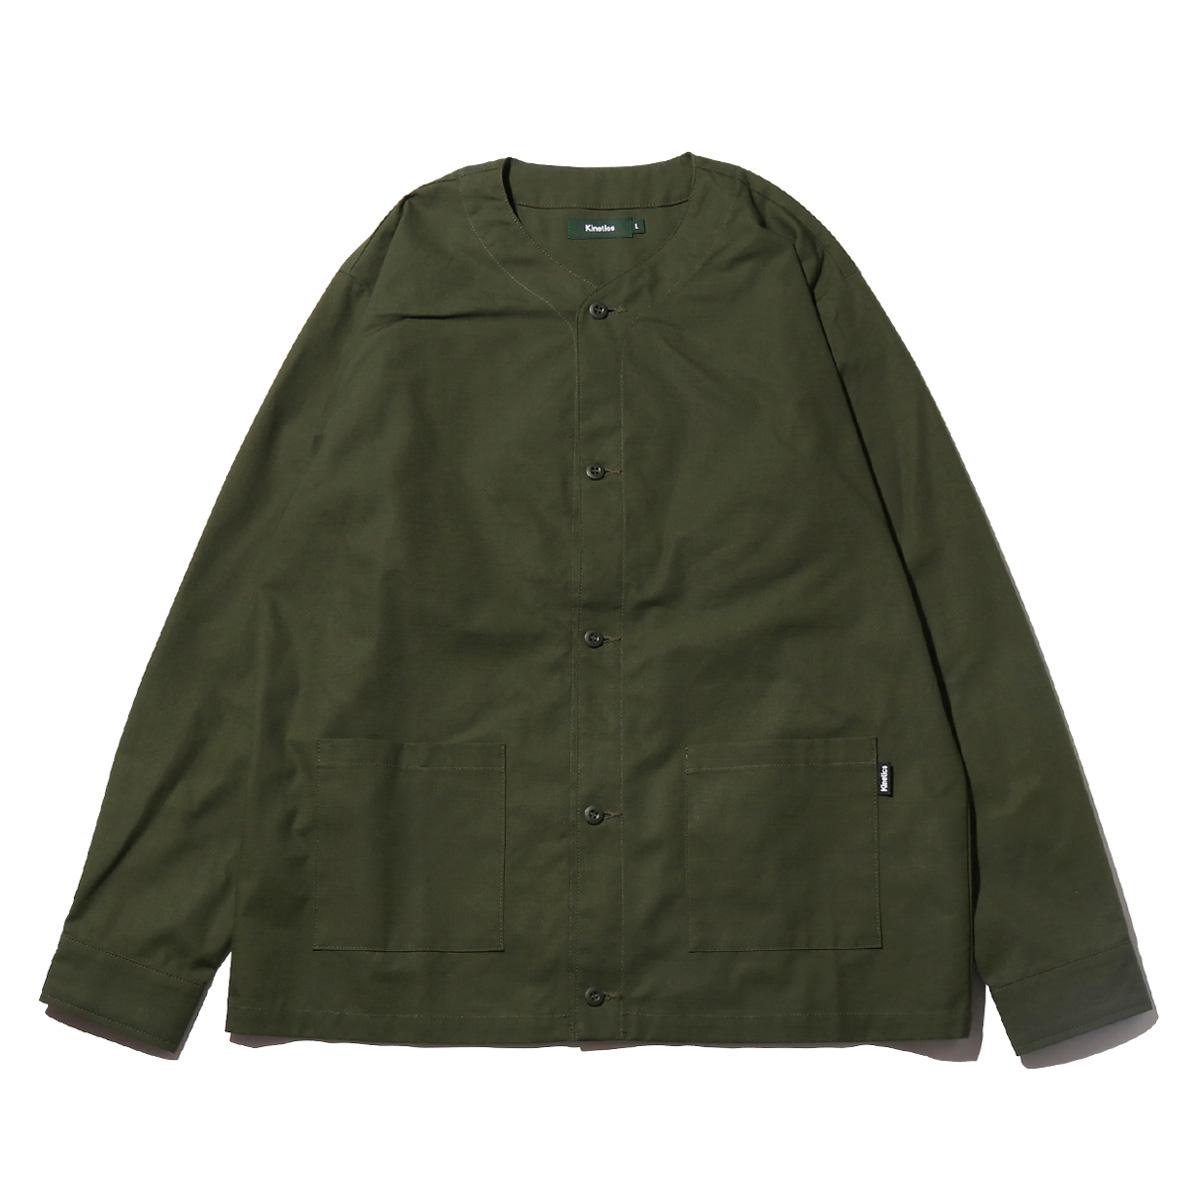 Kinetics Ripstop Cardigan LS Shirt(OLIVE)(キネティクス リップストップ カーディガン LSシャツ)【メンズ】【ノーカラー】【シャツ】【19SS-I】